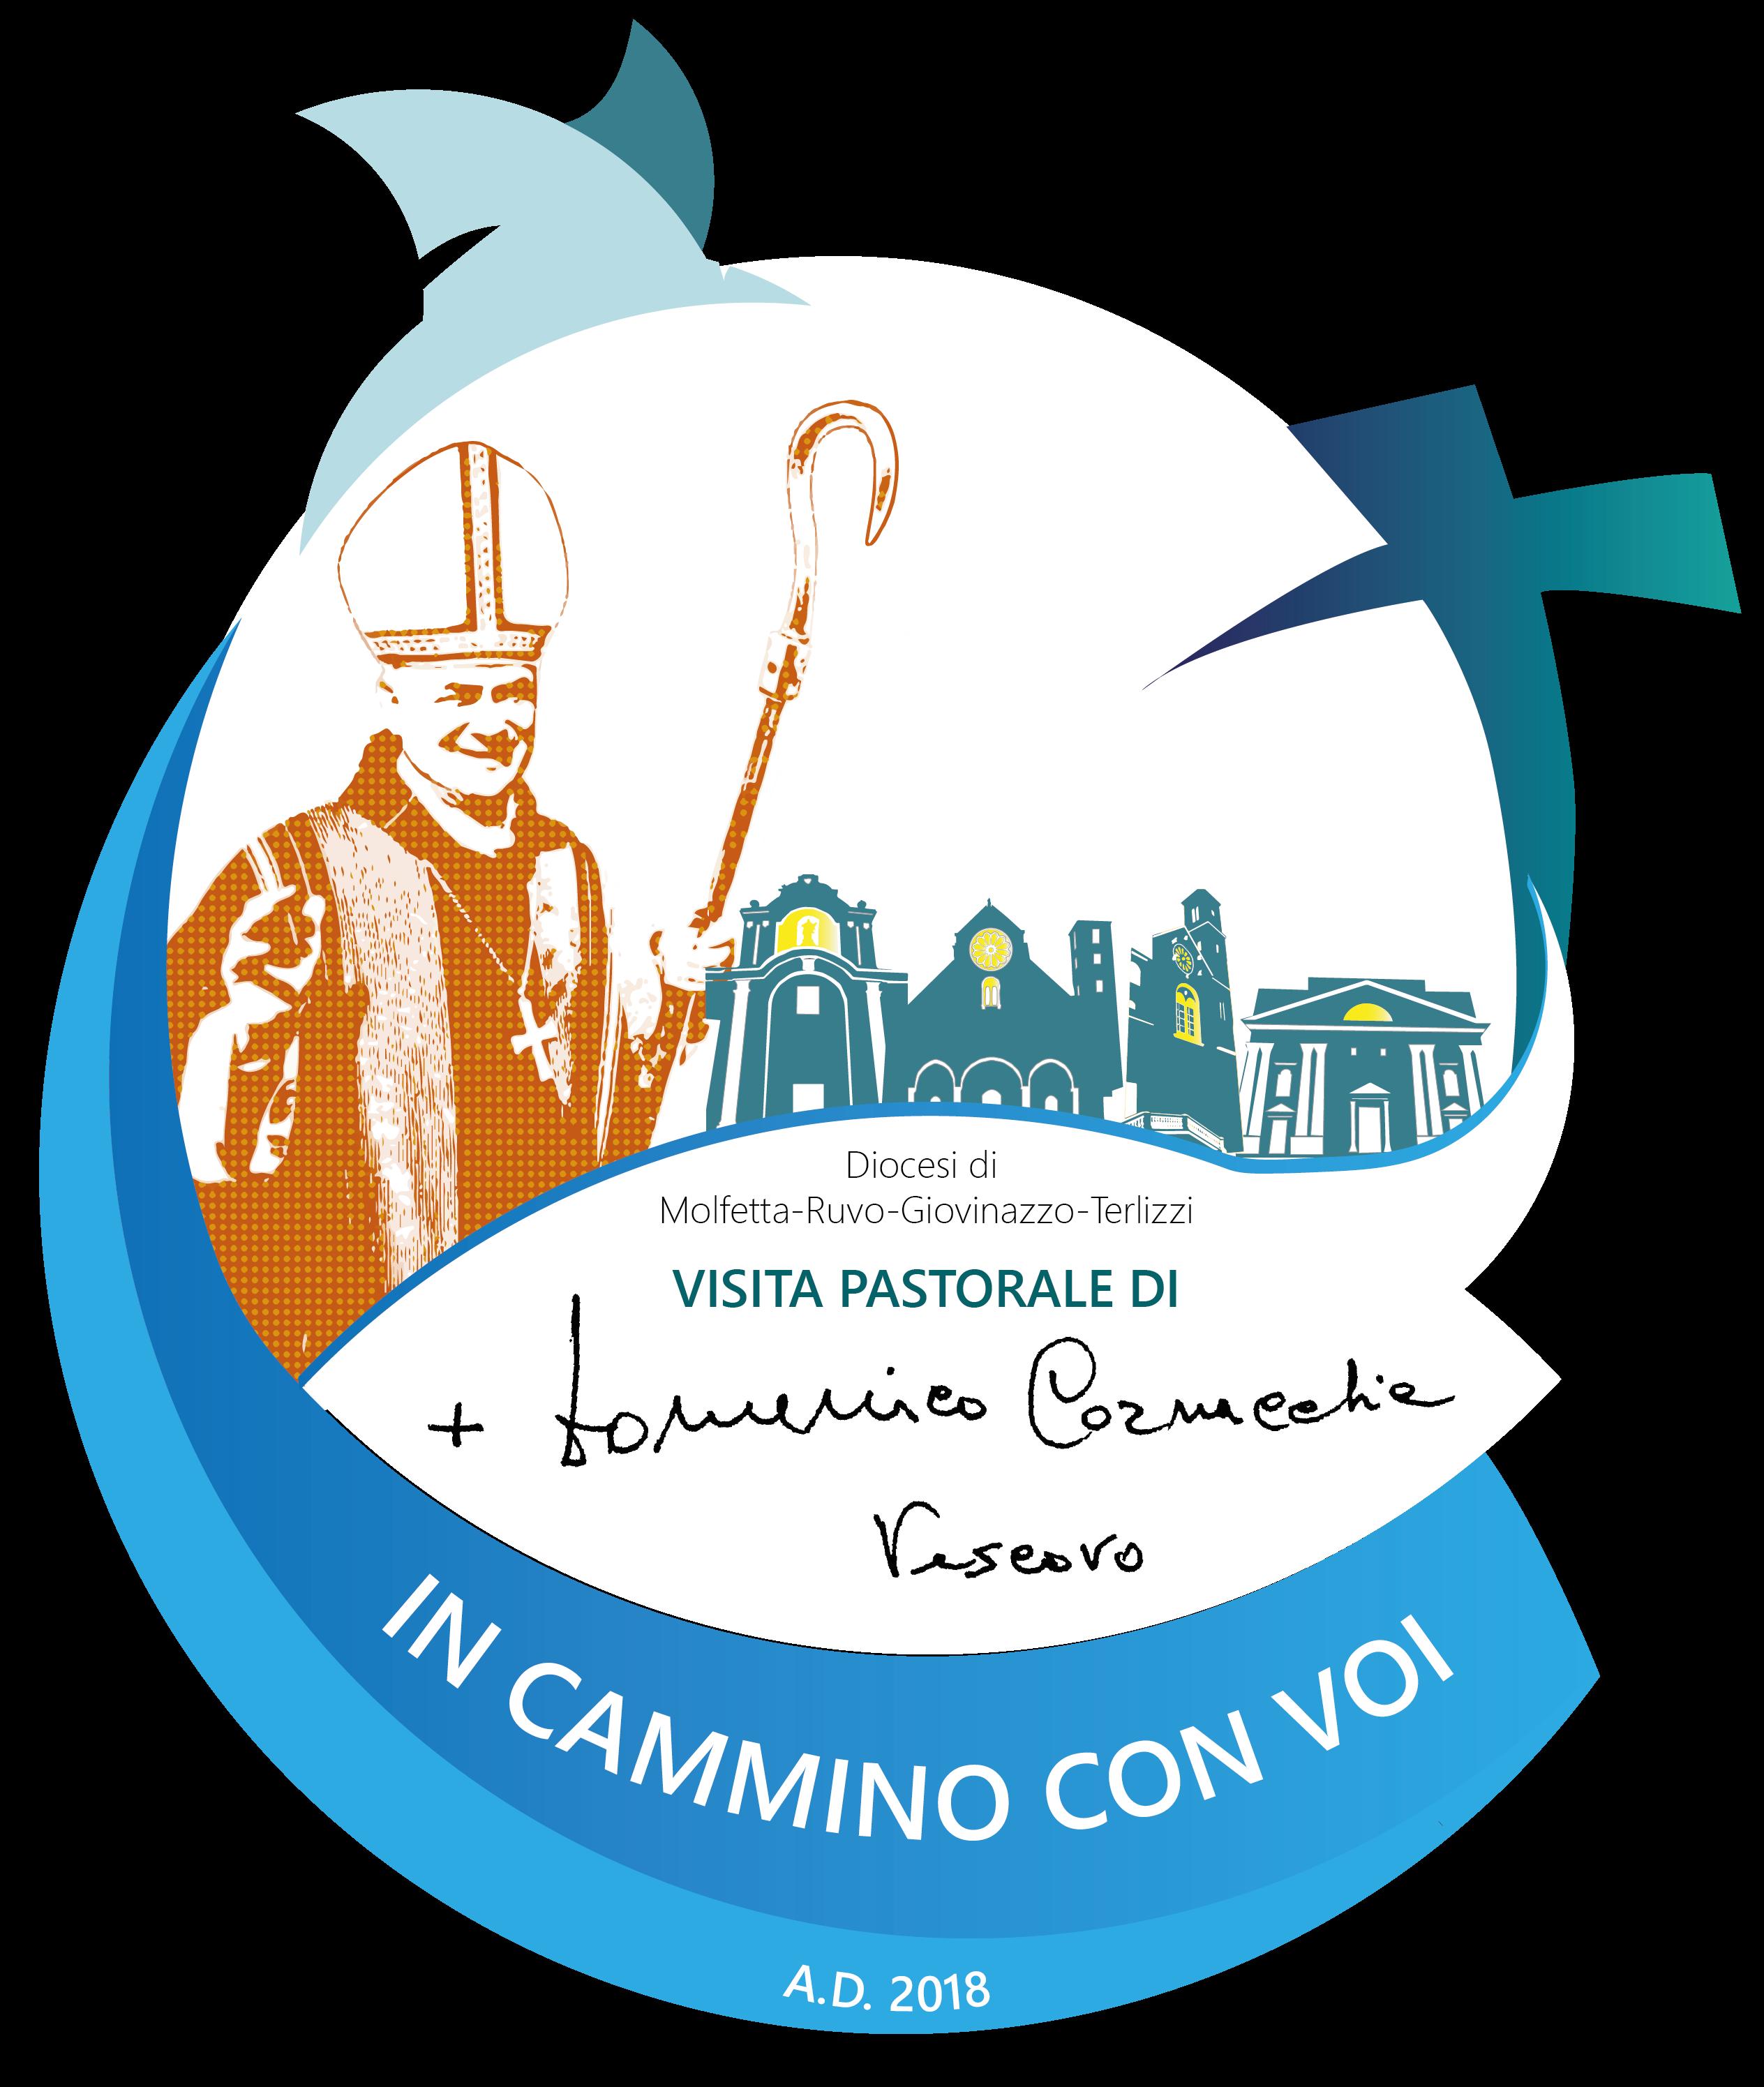 logo della visita pastorale